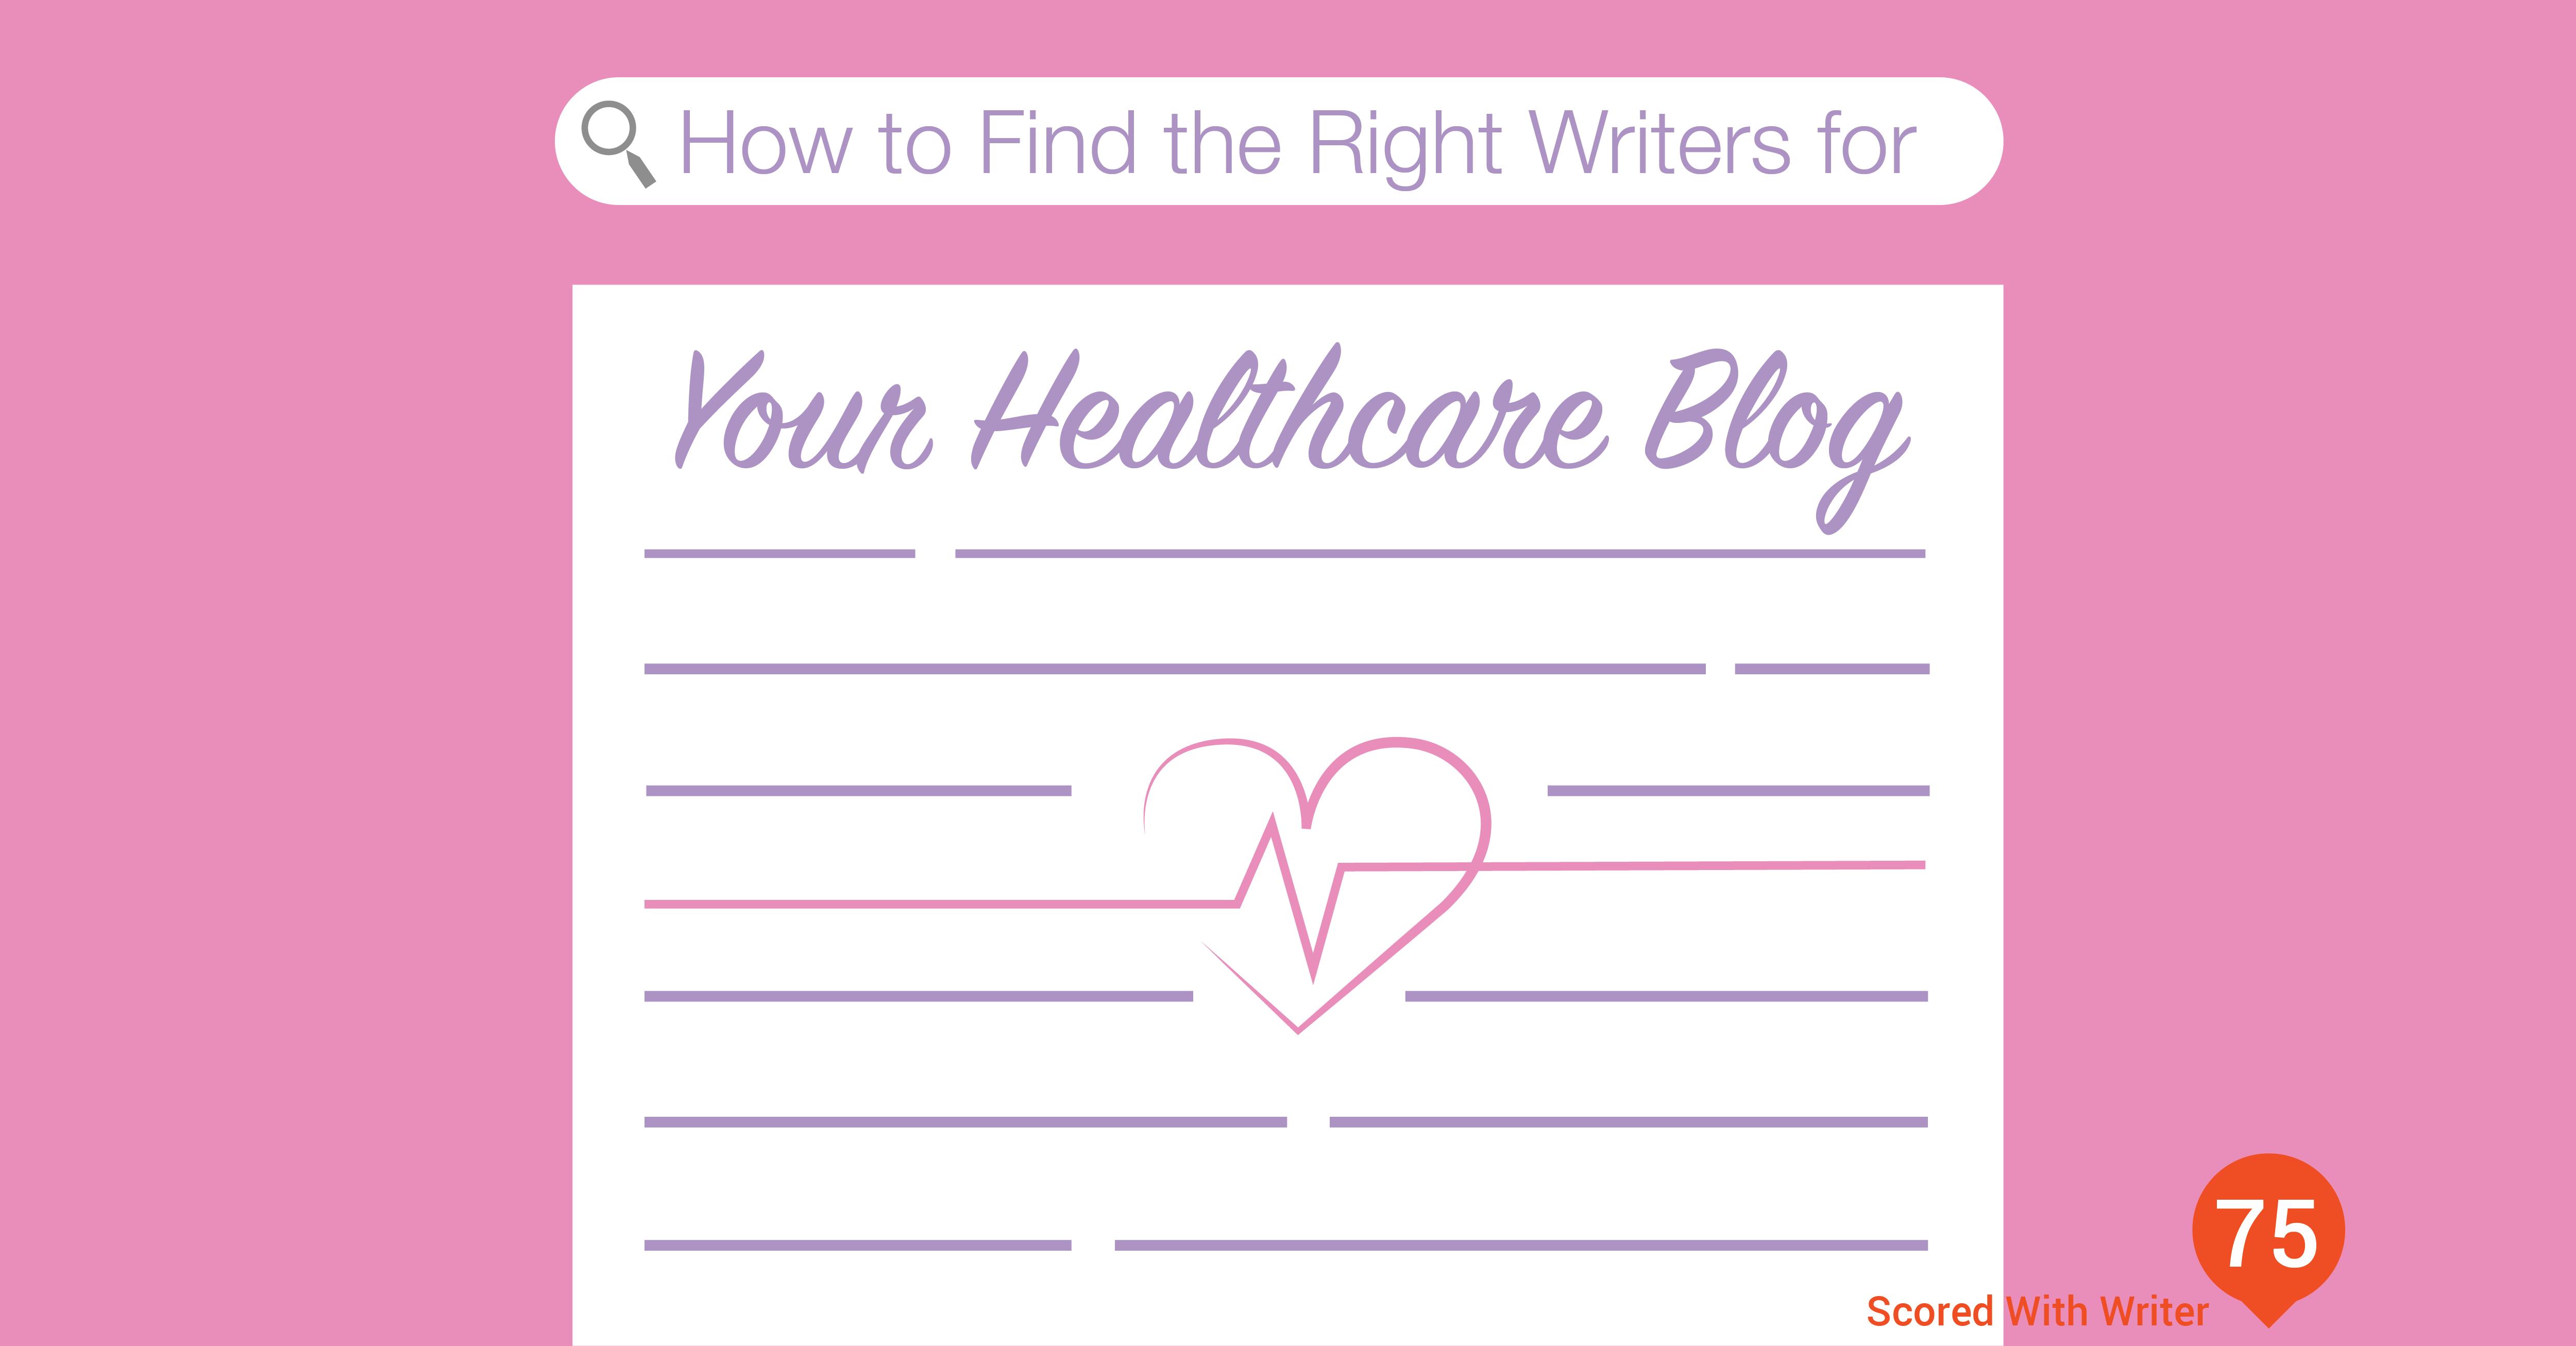 ARBlog_HowtoFindtheRightWritersforYourHealthcareBlog_Mar17_16-04.png